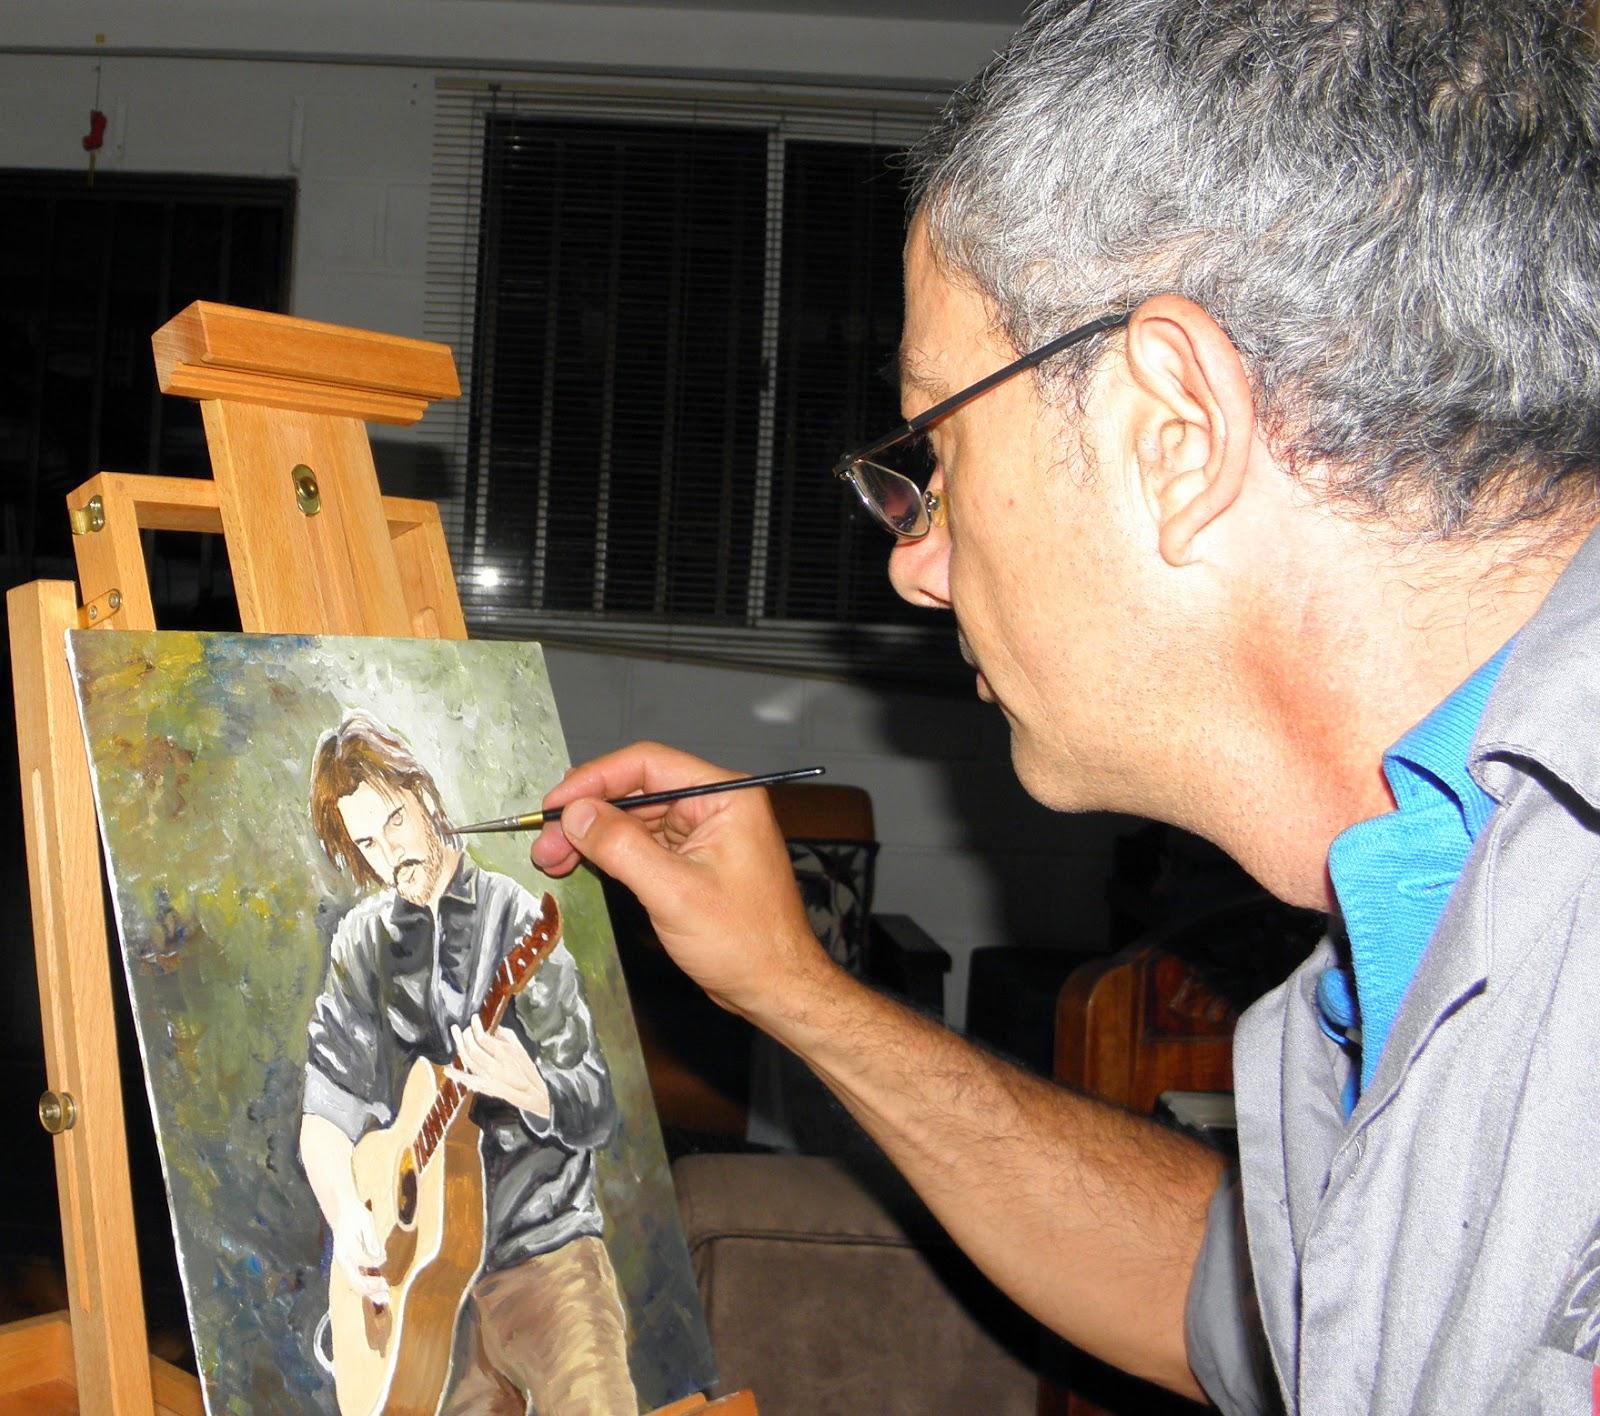 Jorge Marin, Juanes